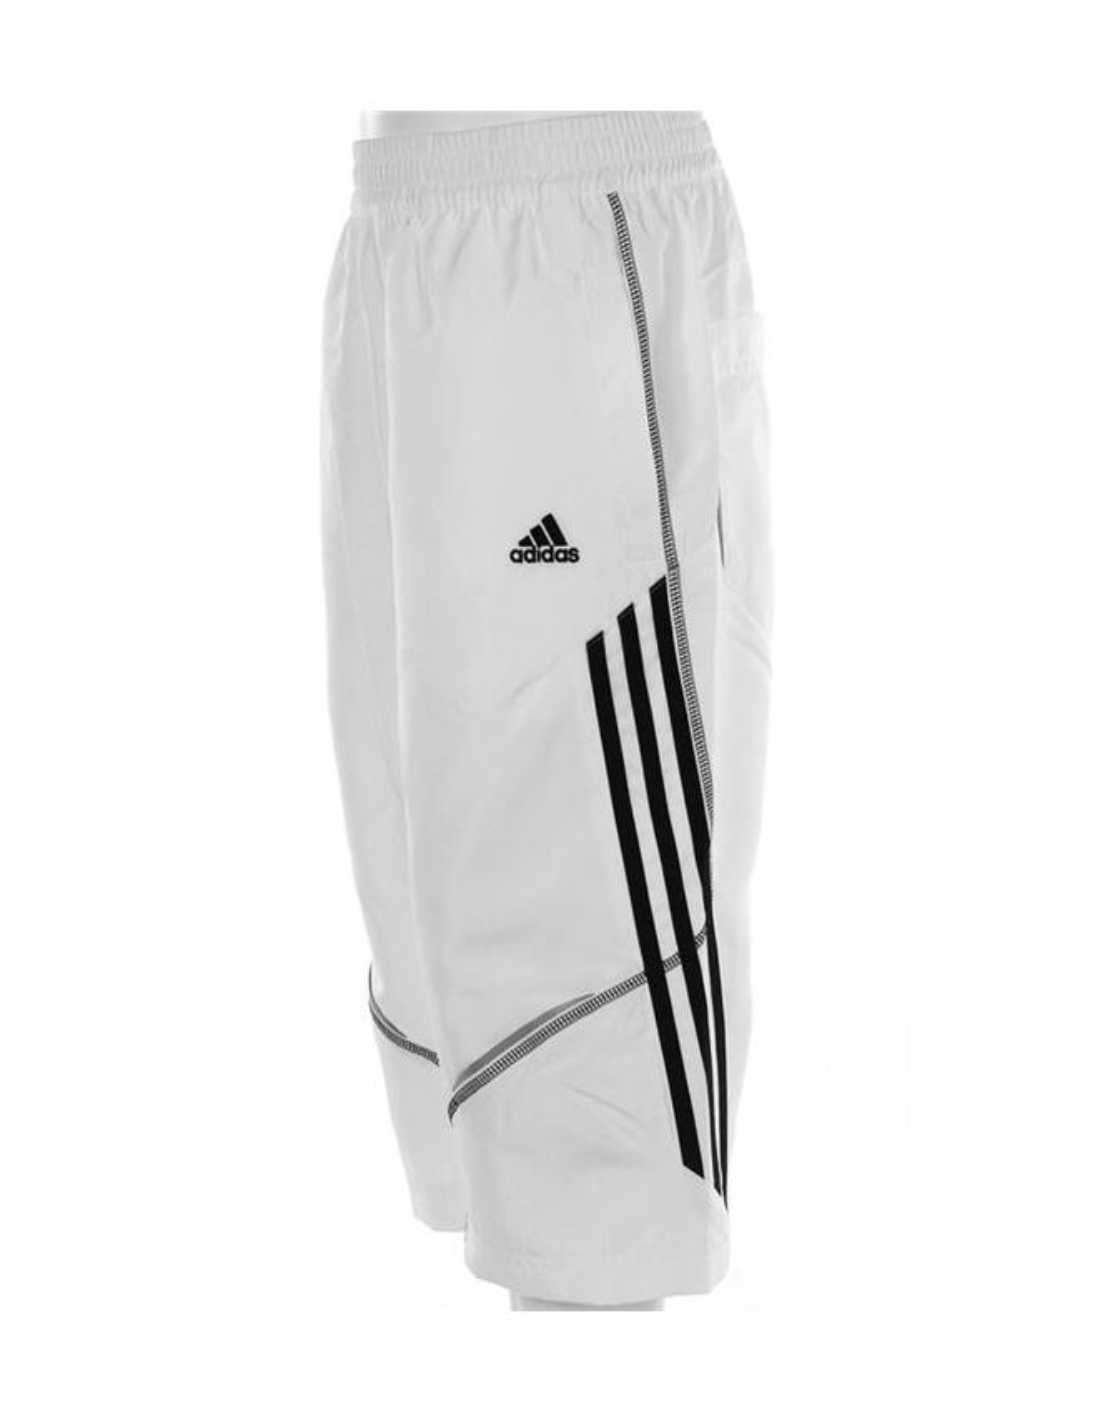 prototipo Oscurecer Razón  ᐈ Pantalones adidas 3/4 – Atmosfera Sport©